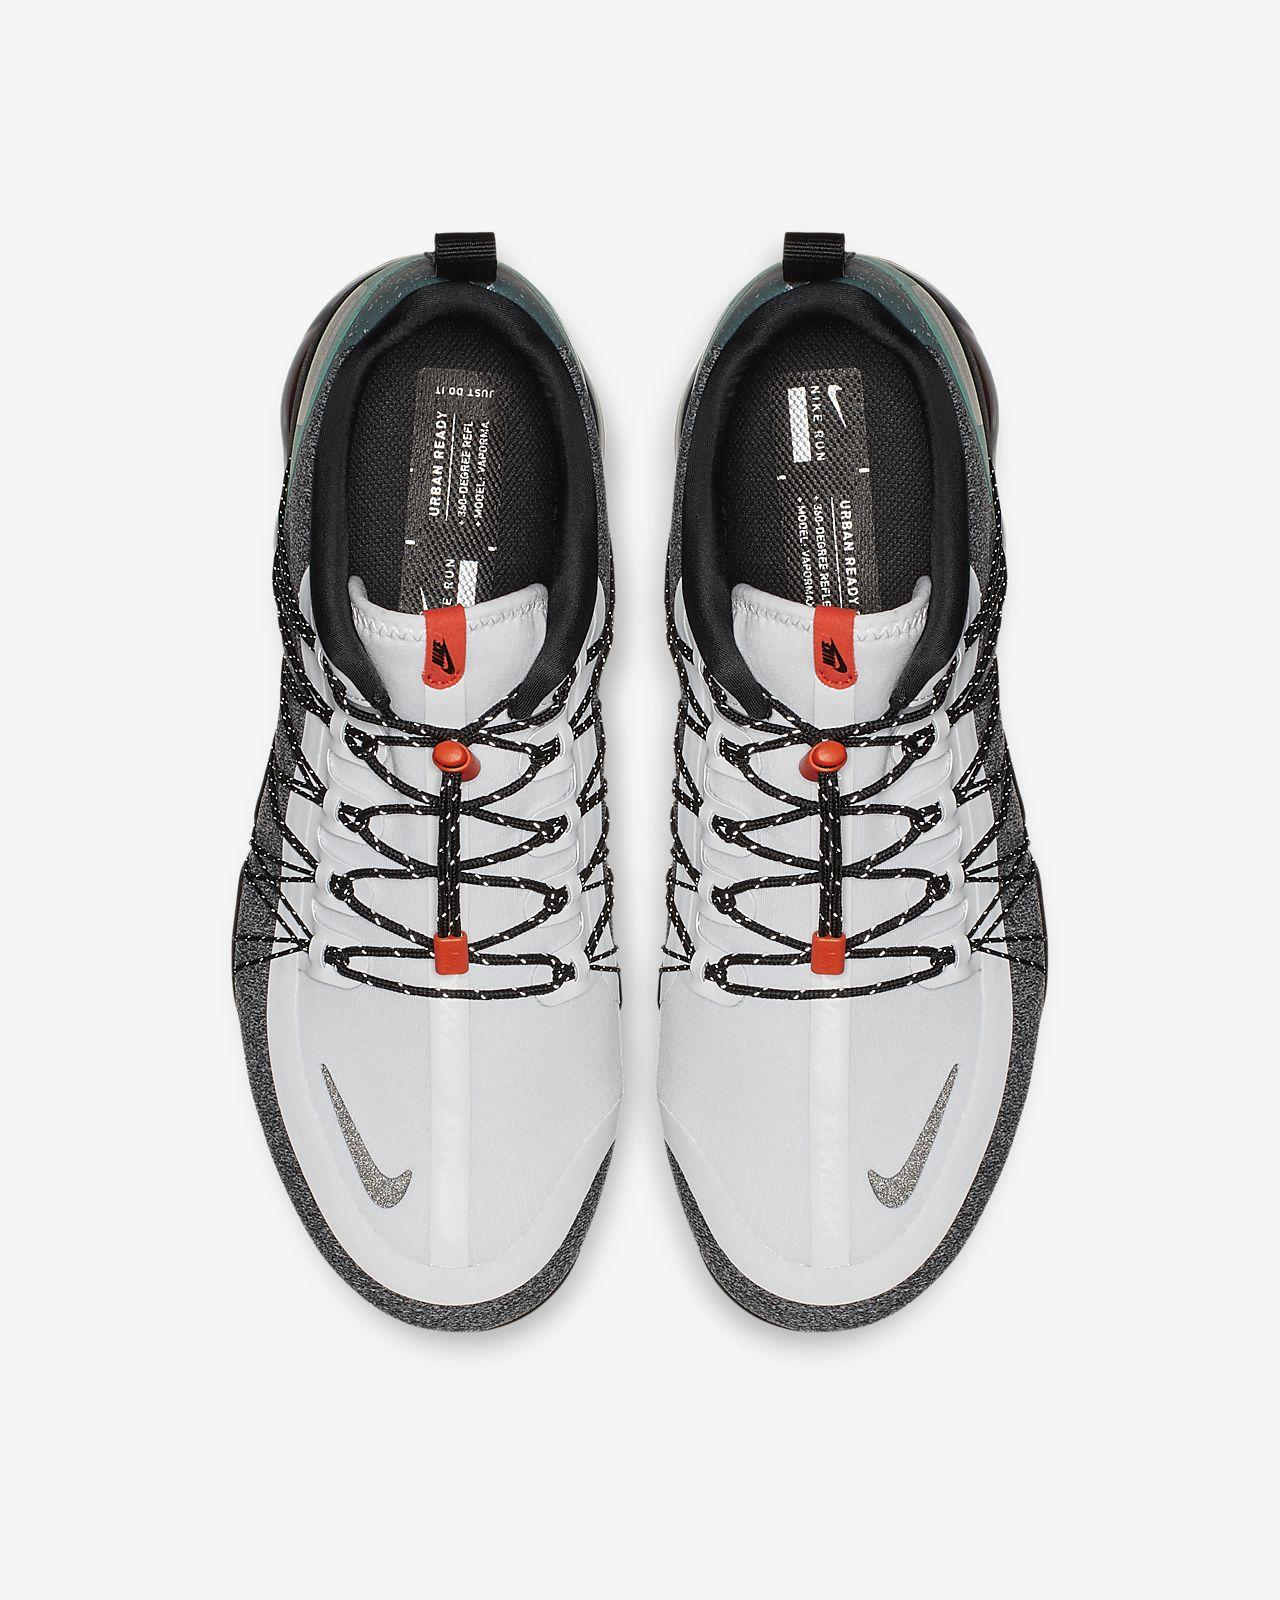 Utility Nike Pour Chaussure Vapormax Homme Air dCtxosQhrB